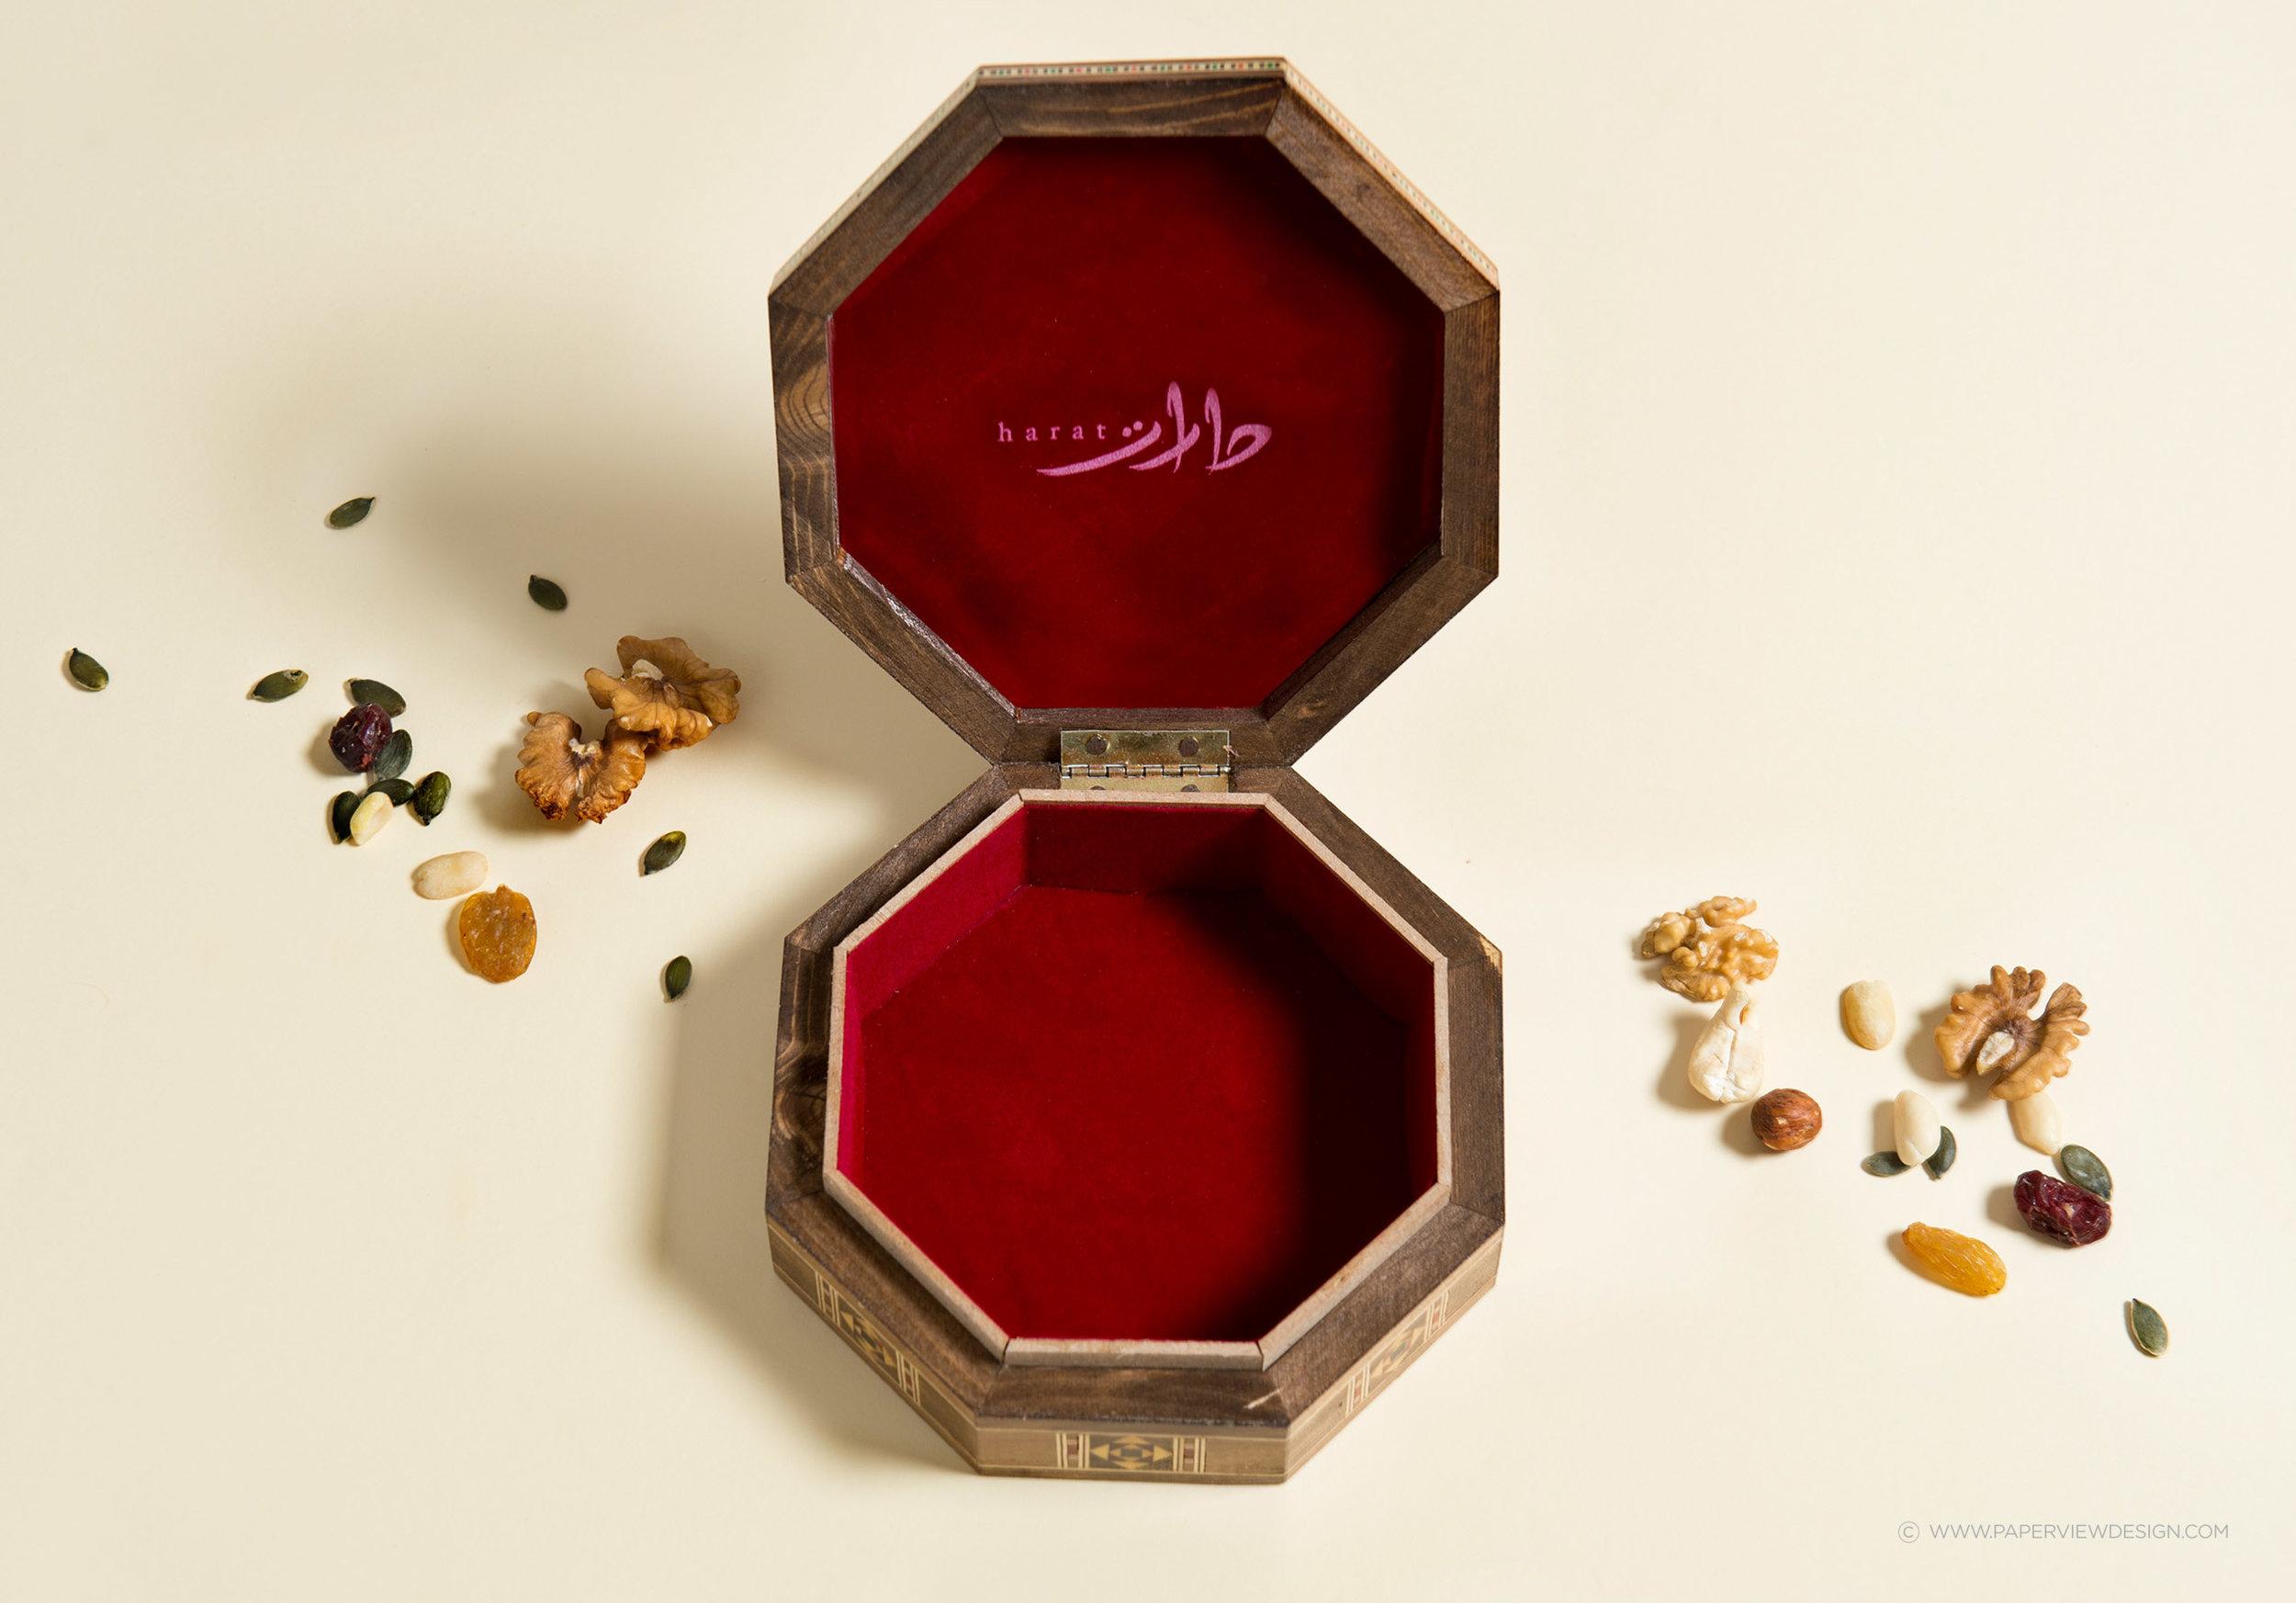 Harat_Backgammon_Billholder_Box_Logo_Arabic